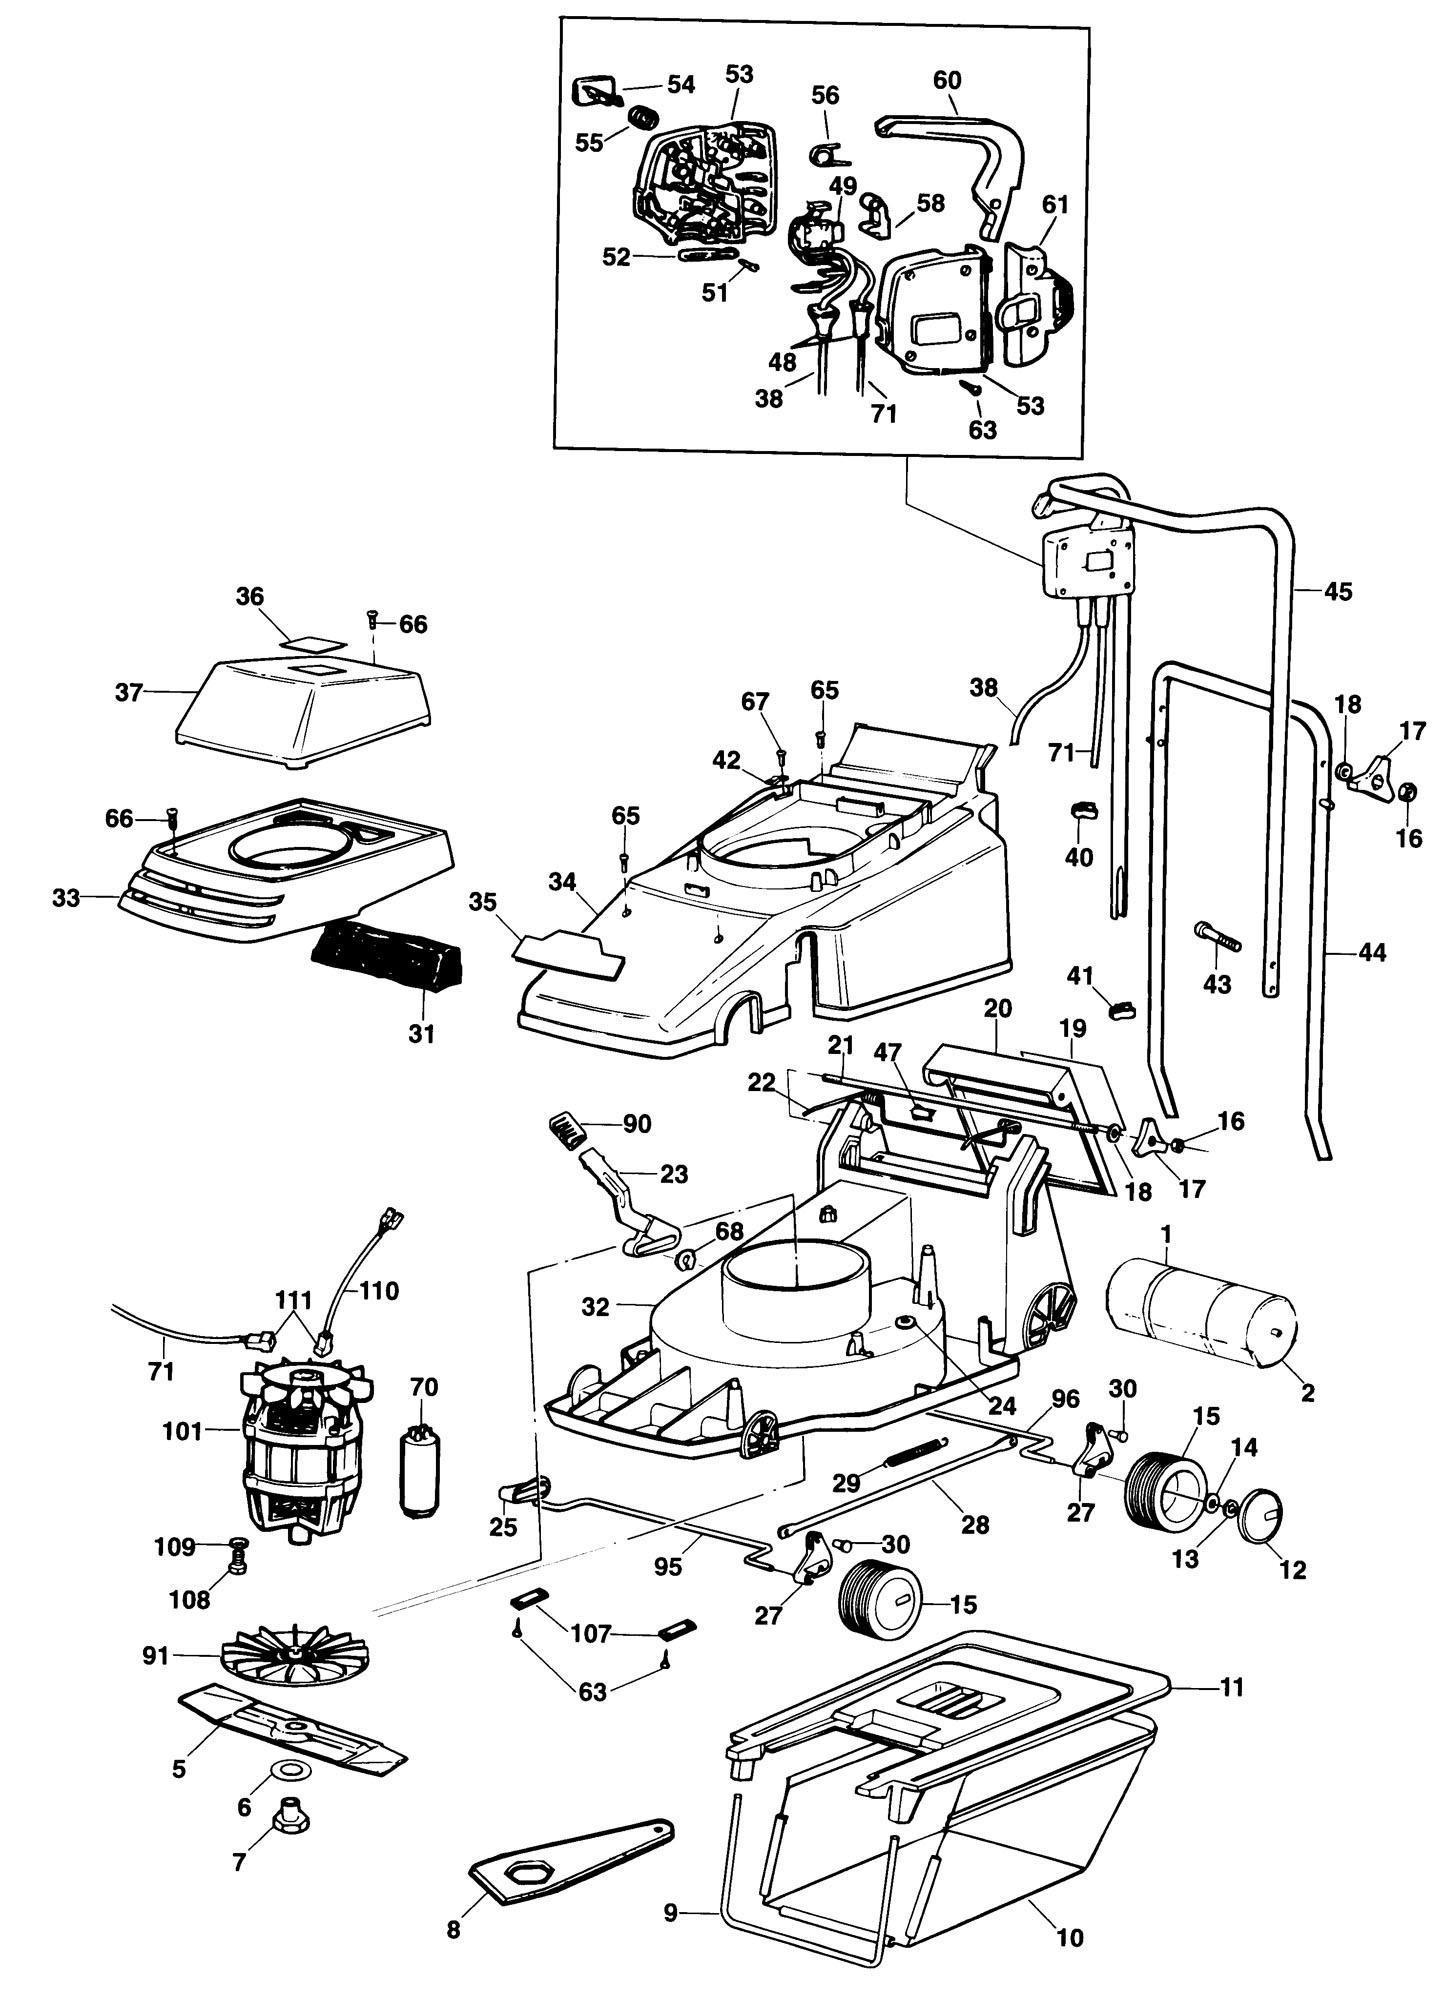 Spares For Black Amp Decker Gr360 Rotary Mower Type H4c